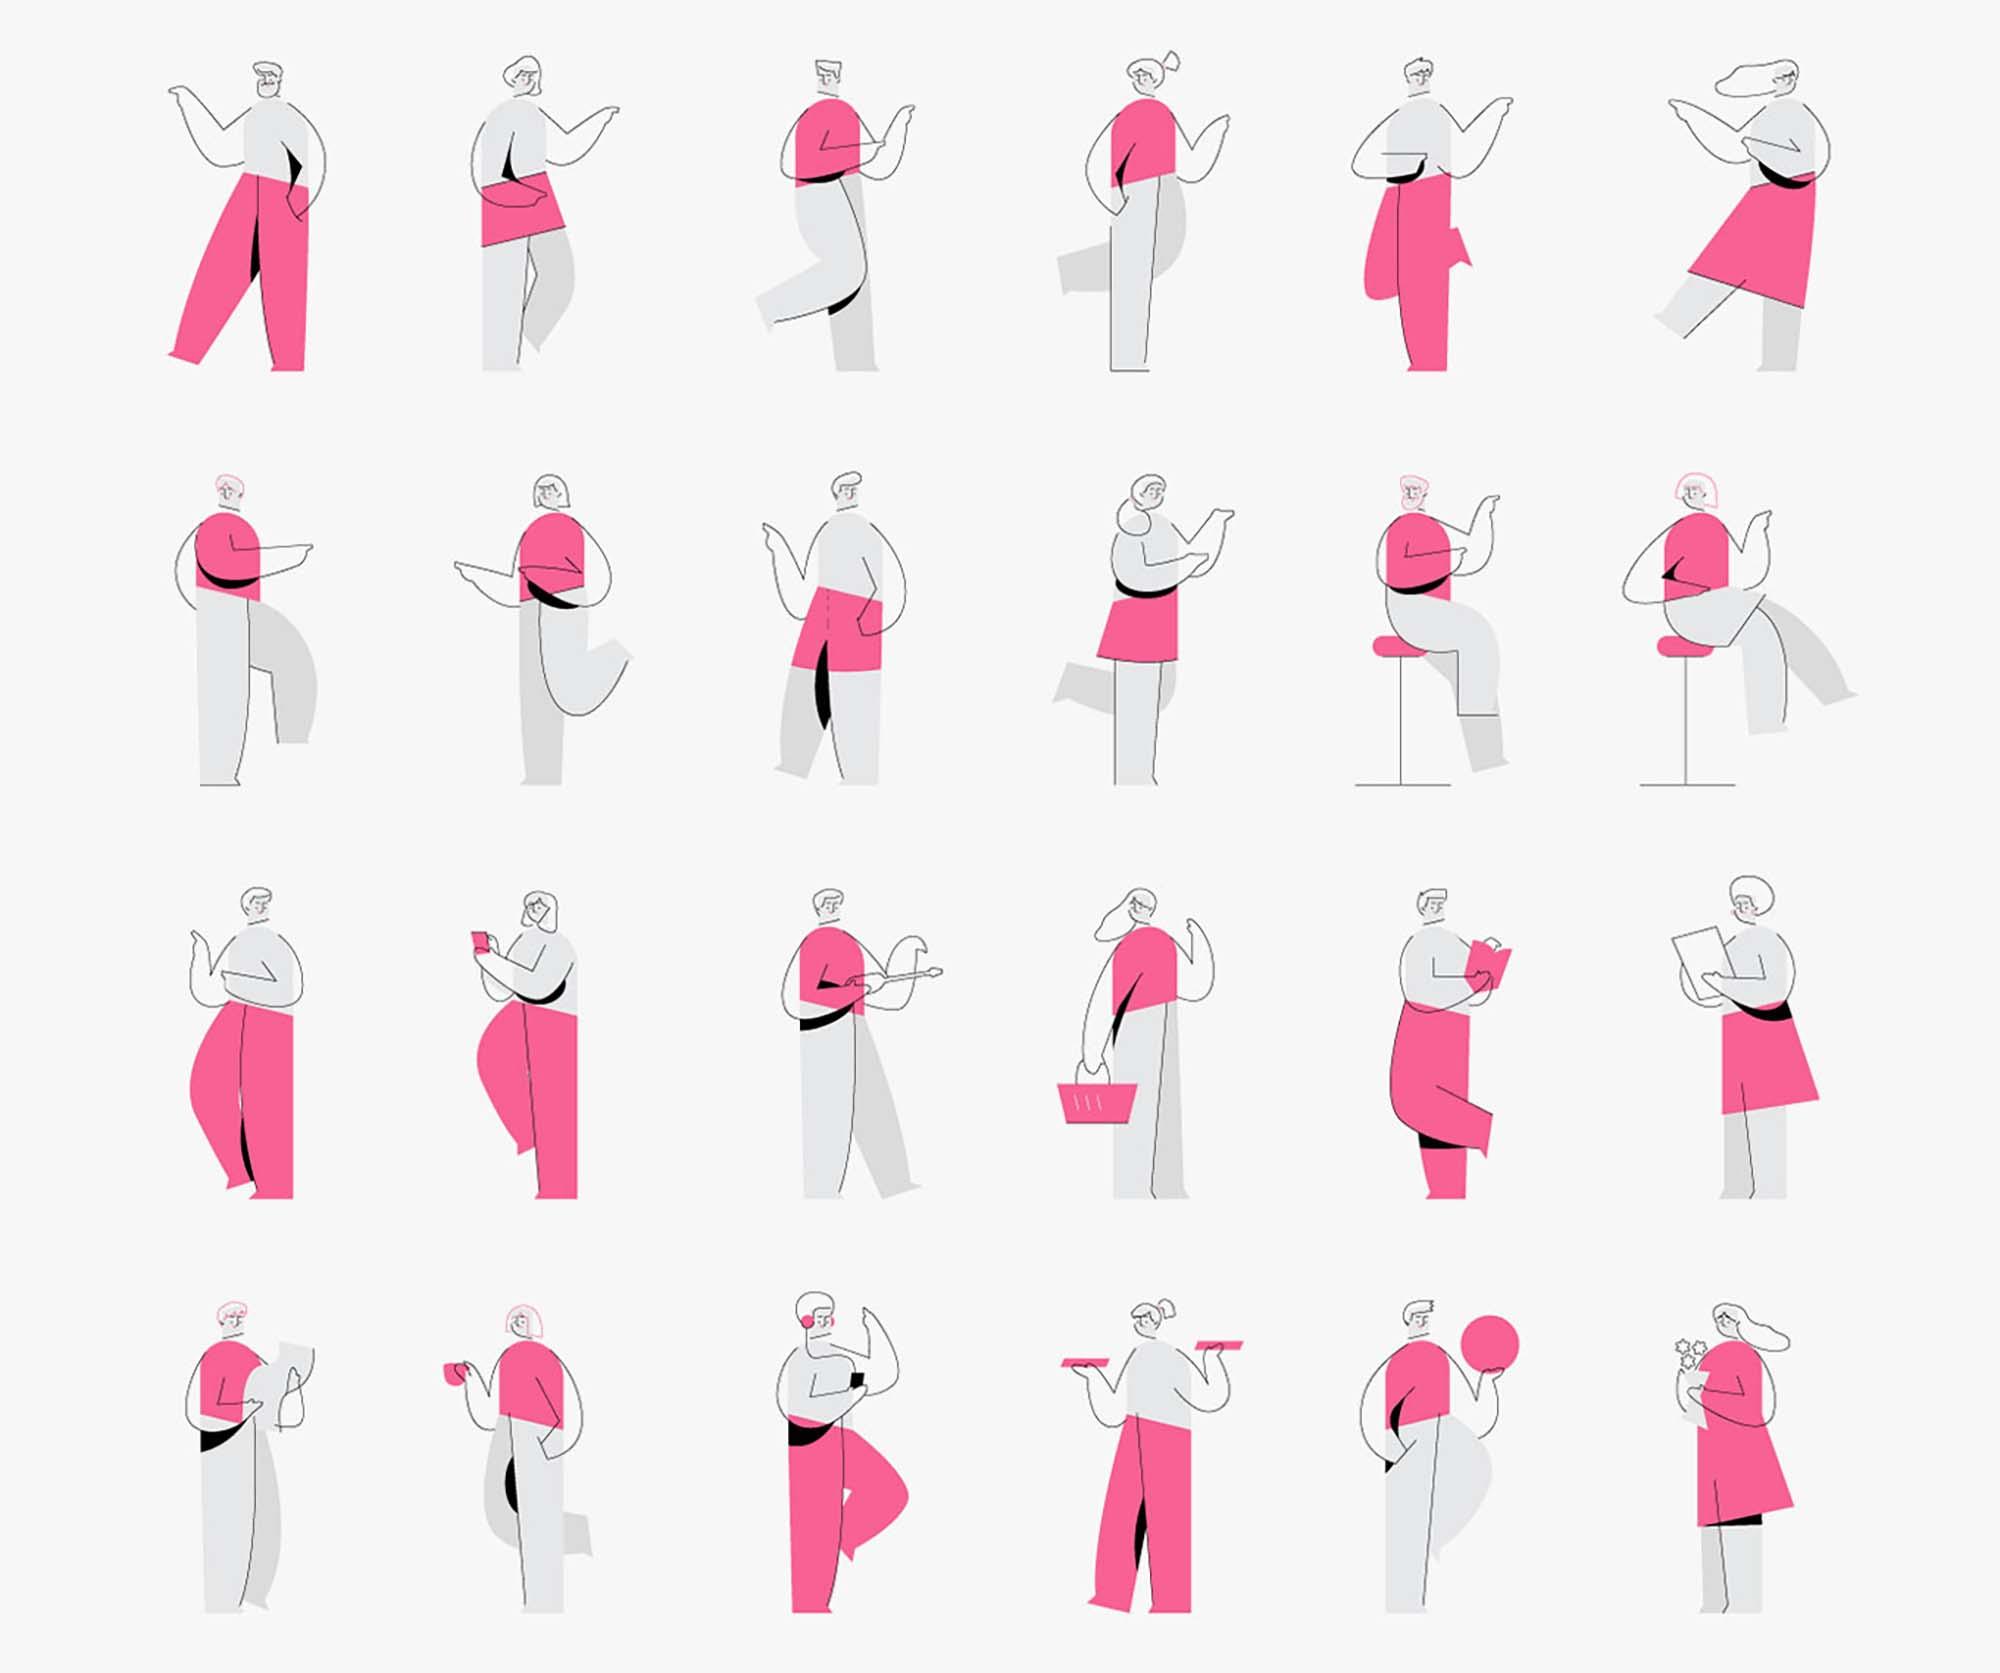 Minimalistic Characters Illustrations 1